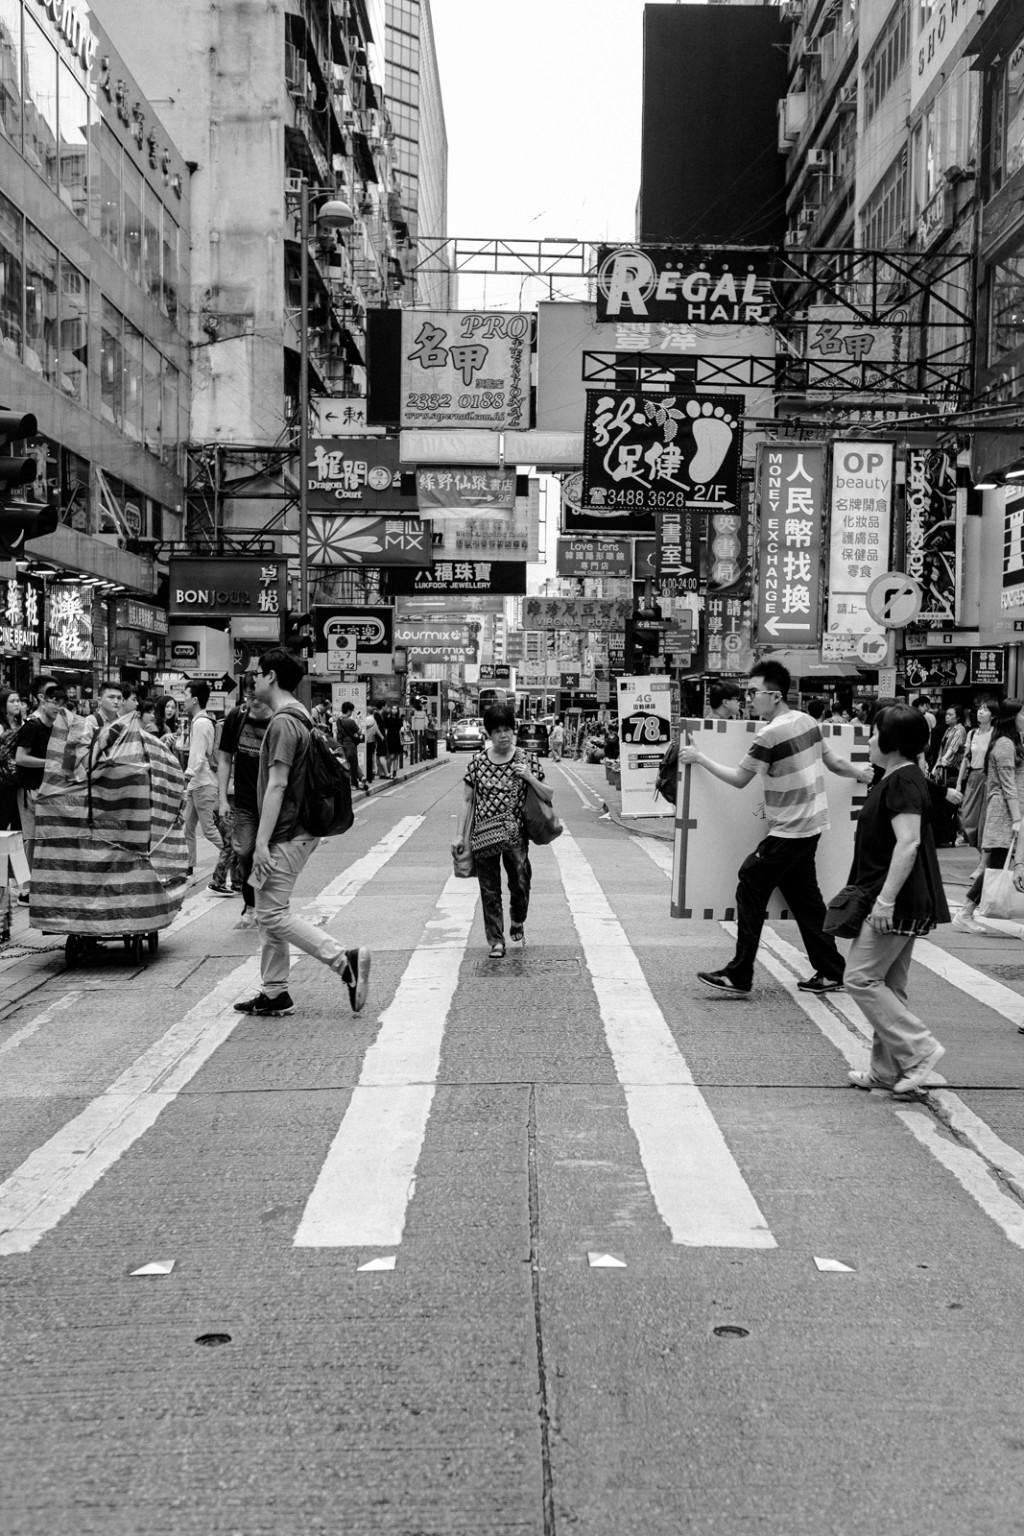 BENJAMIN MARKSTEIN Hong Kong